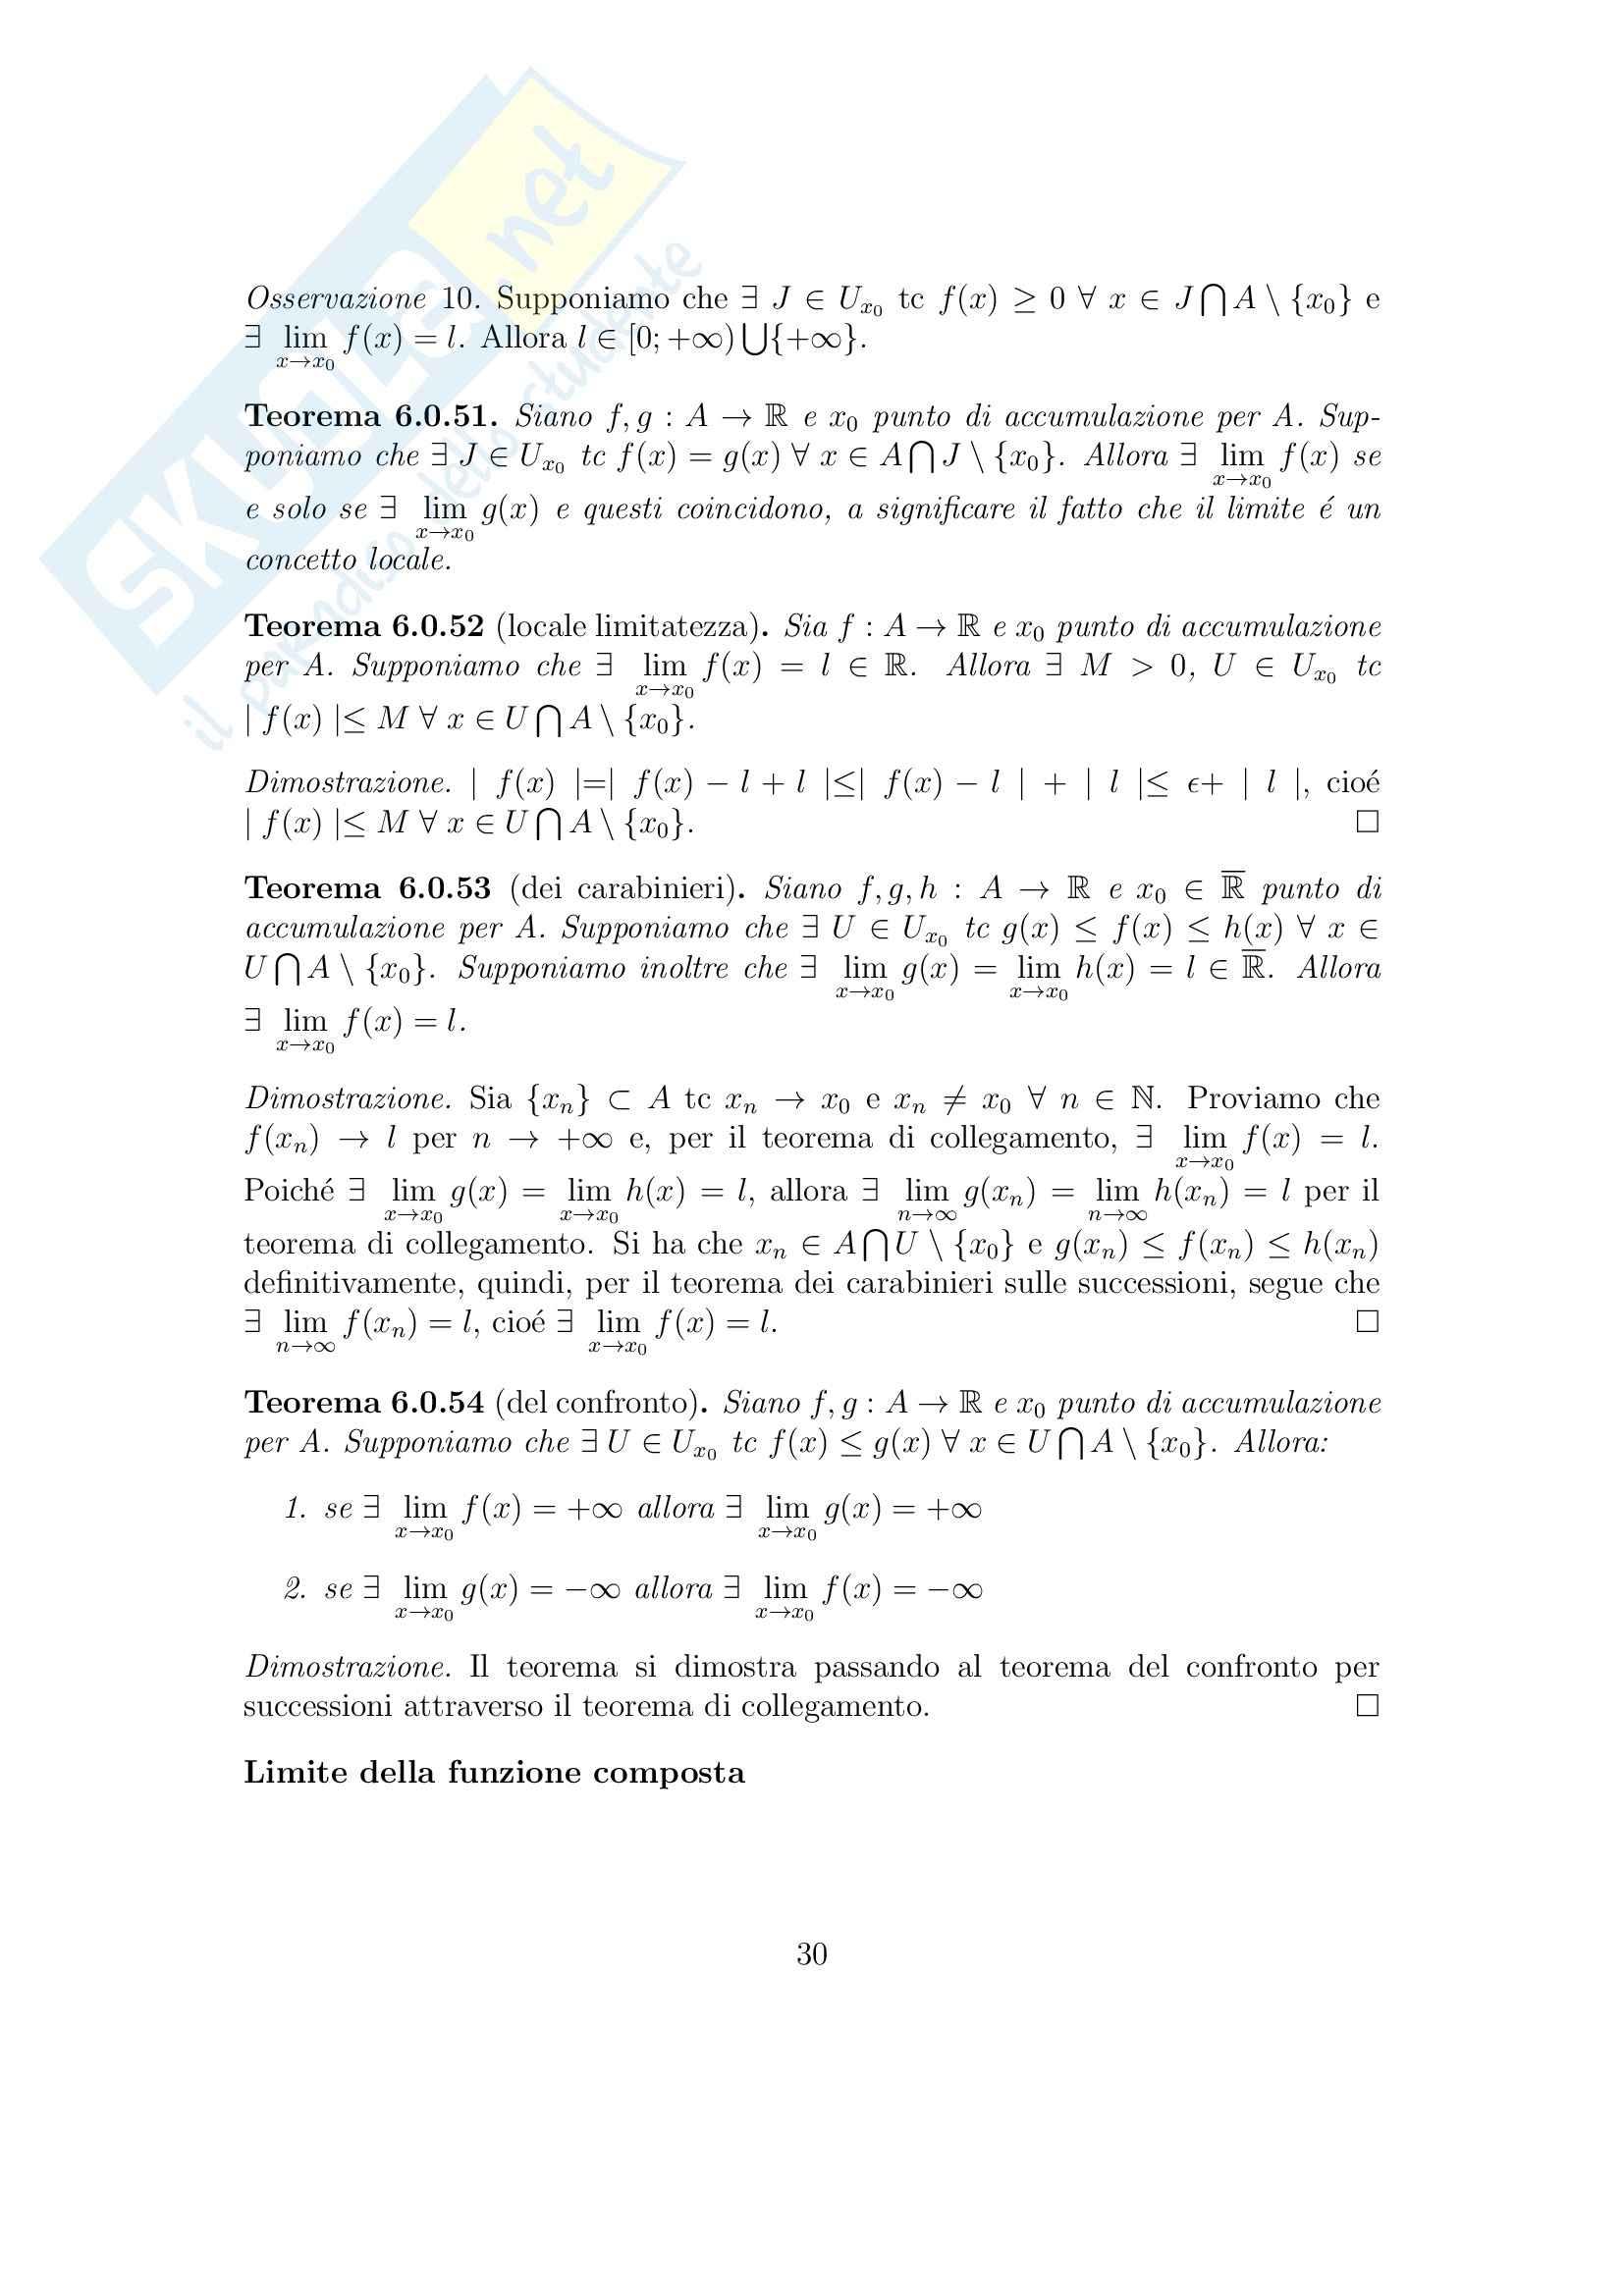 Analisi matematica 1 - Appunti Pag. 31